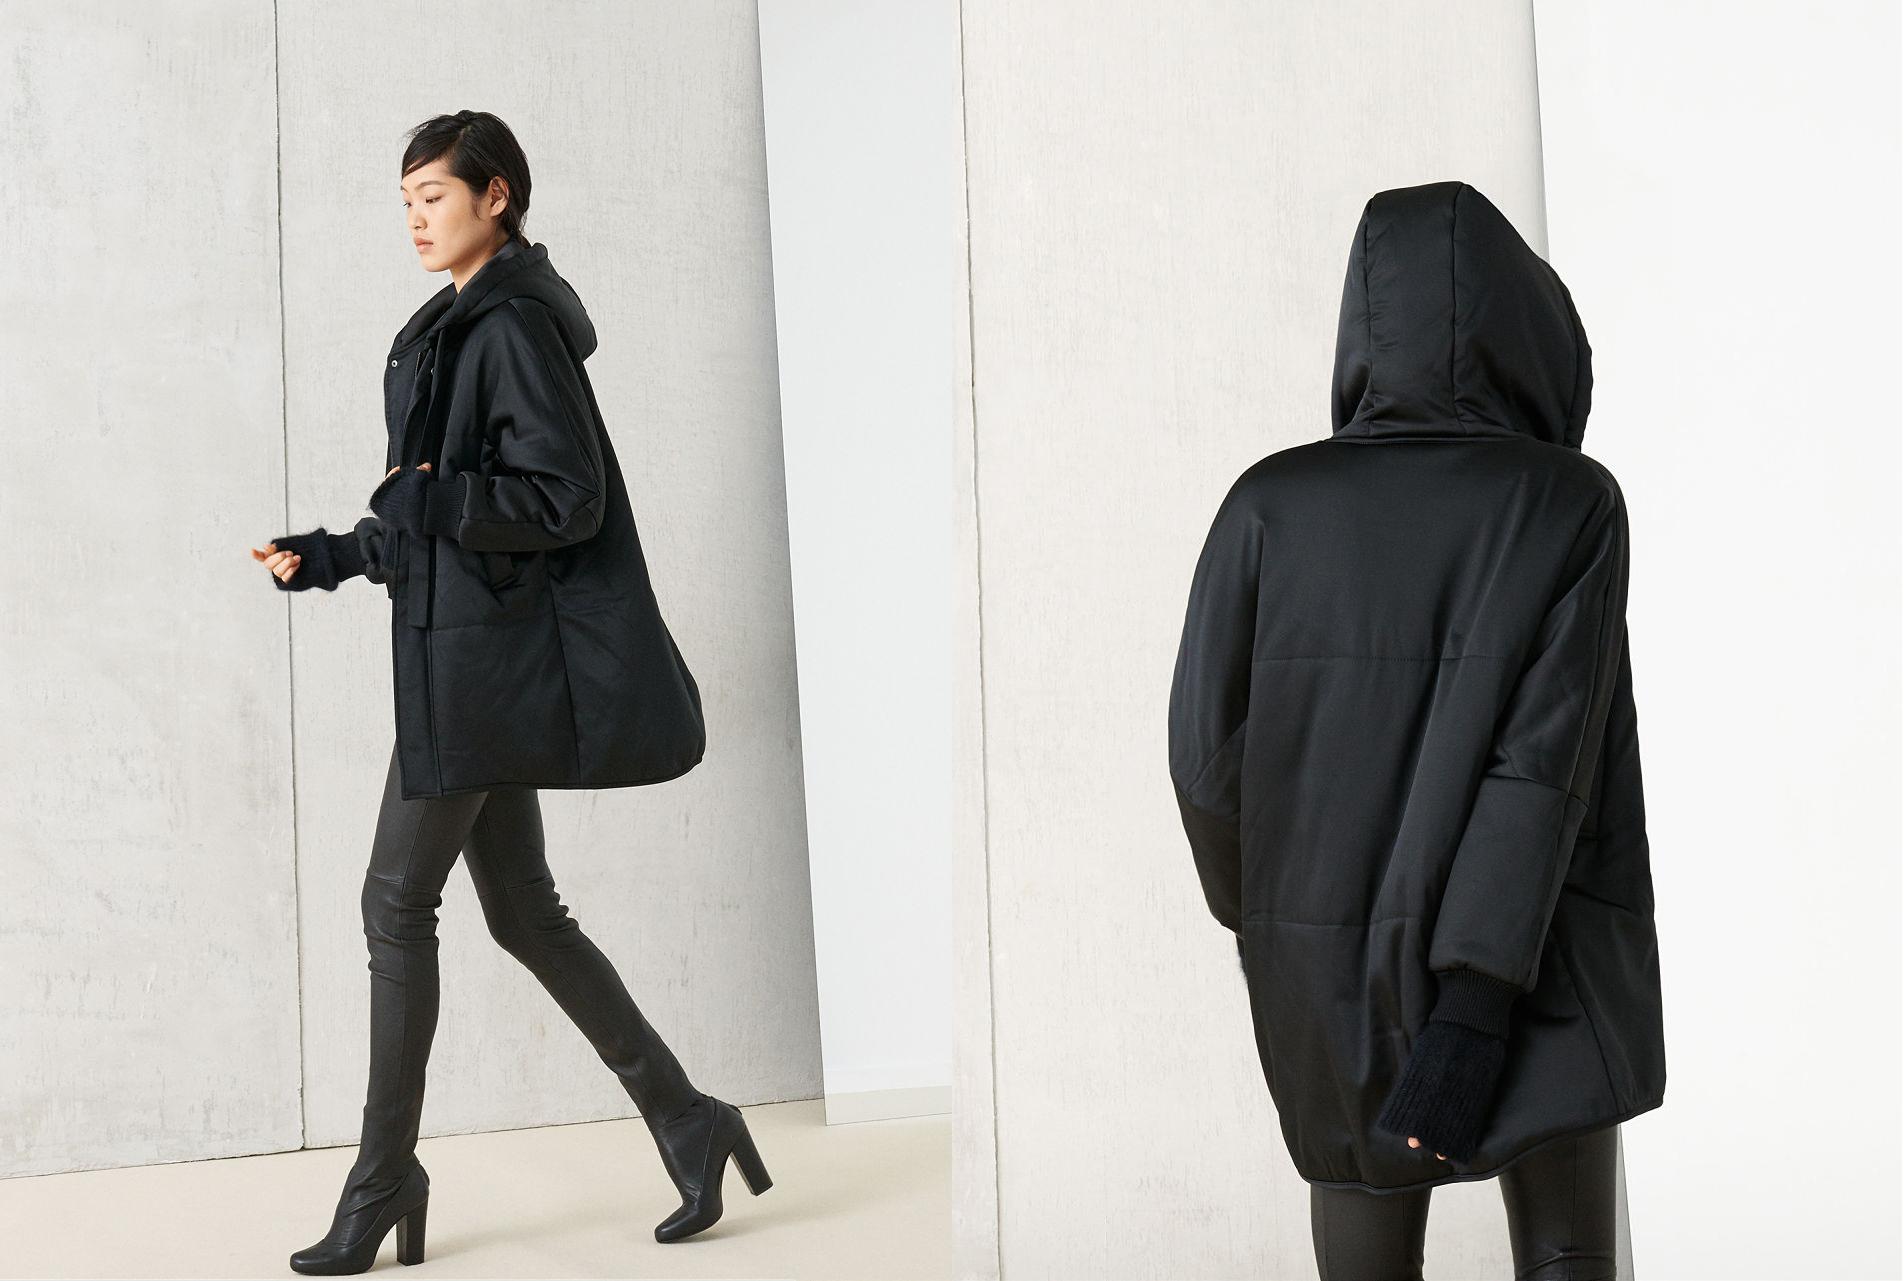 Zara November look book